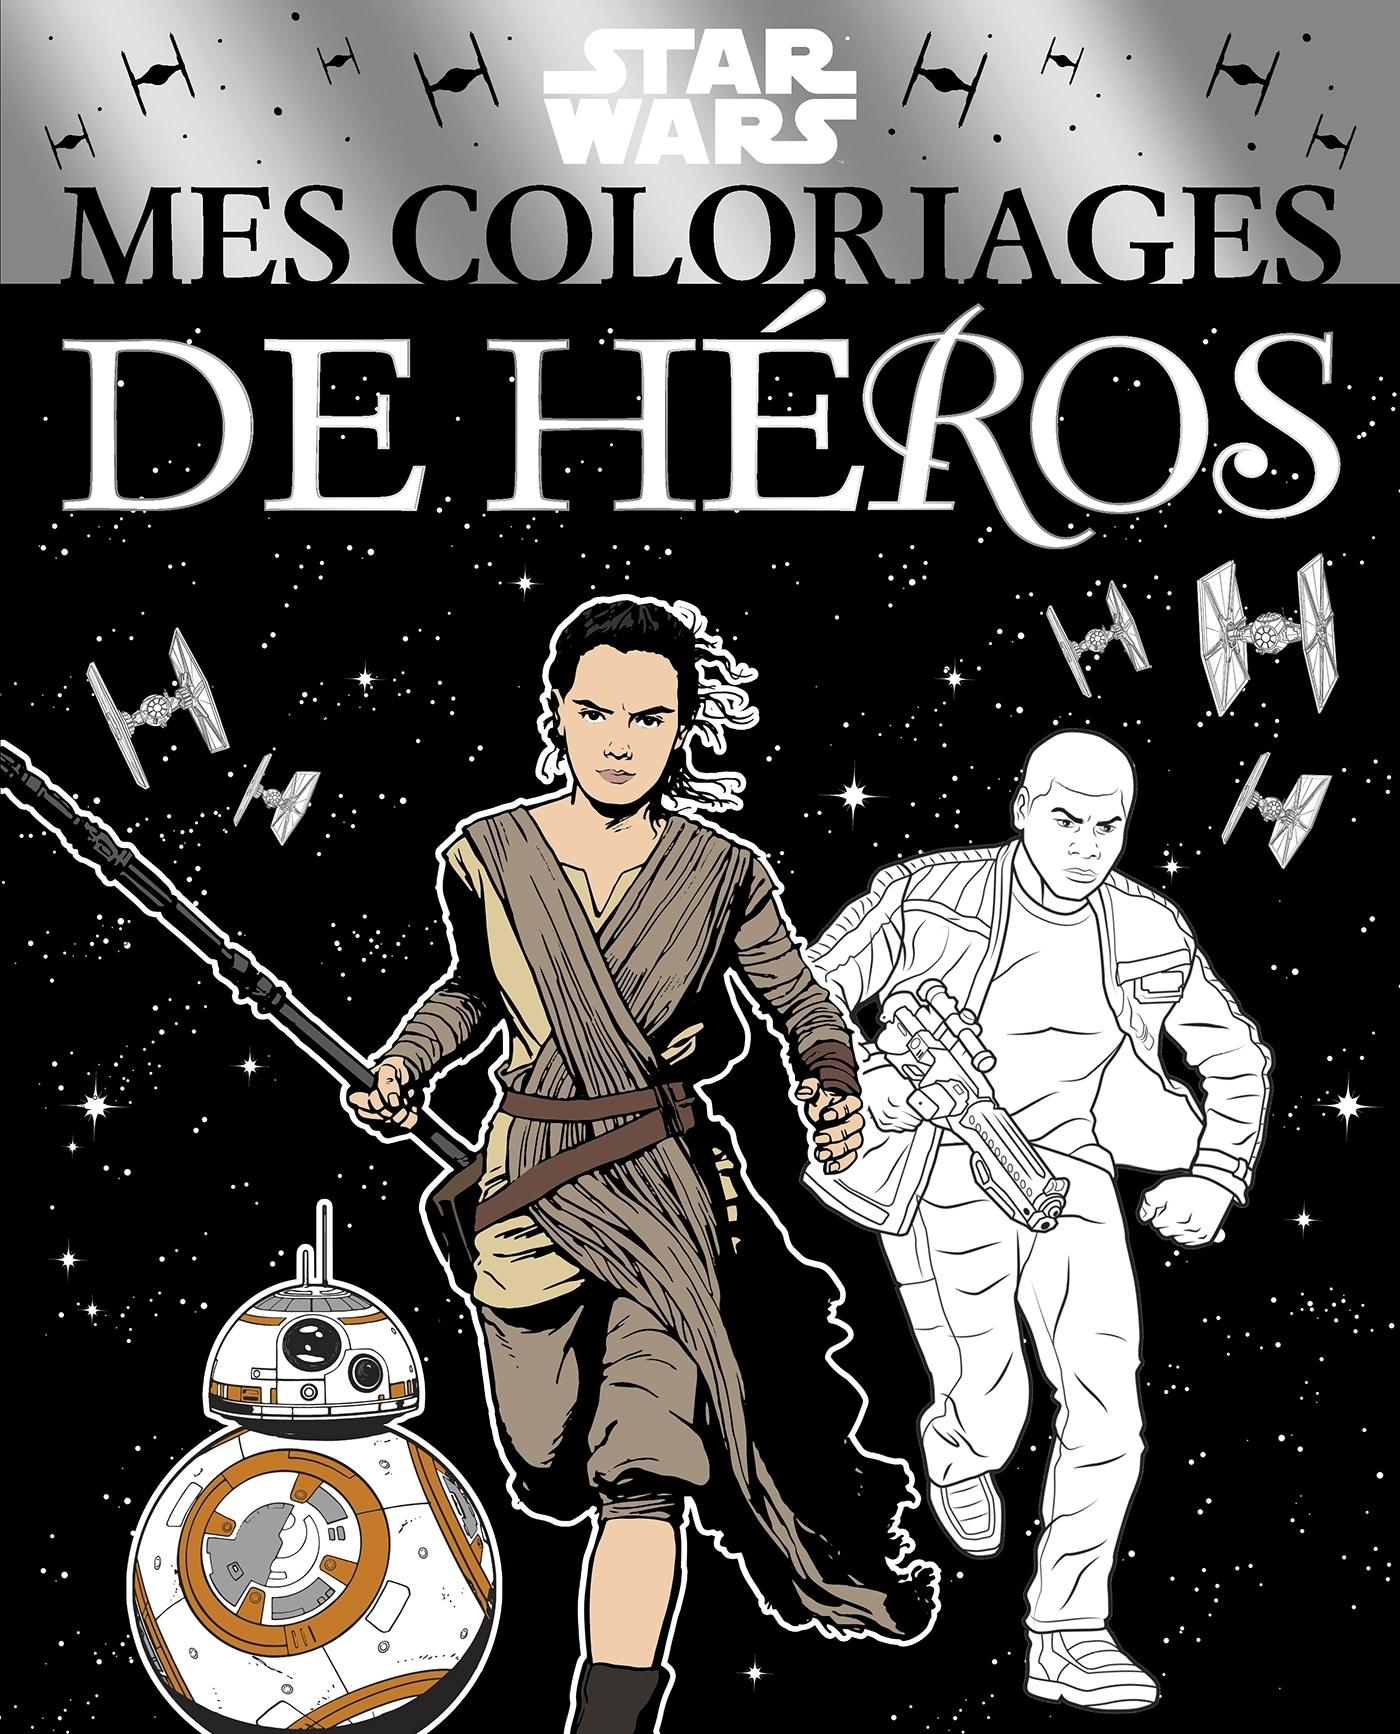 STAR WARS - MES COLORIAGES DE HEROS